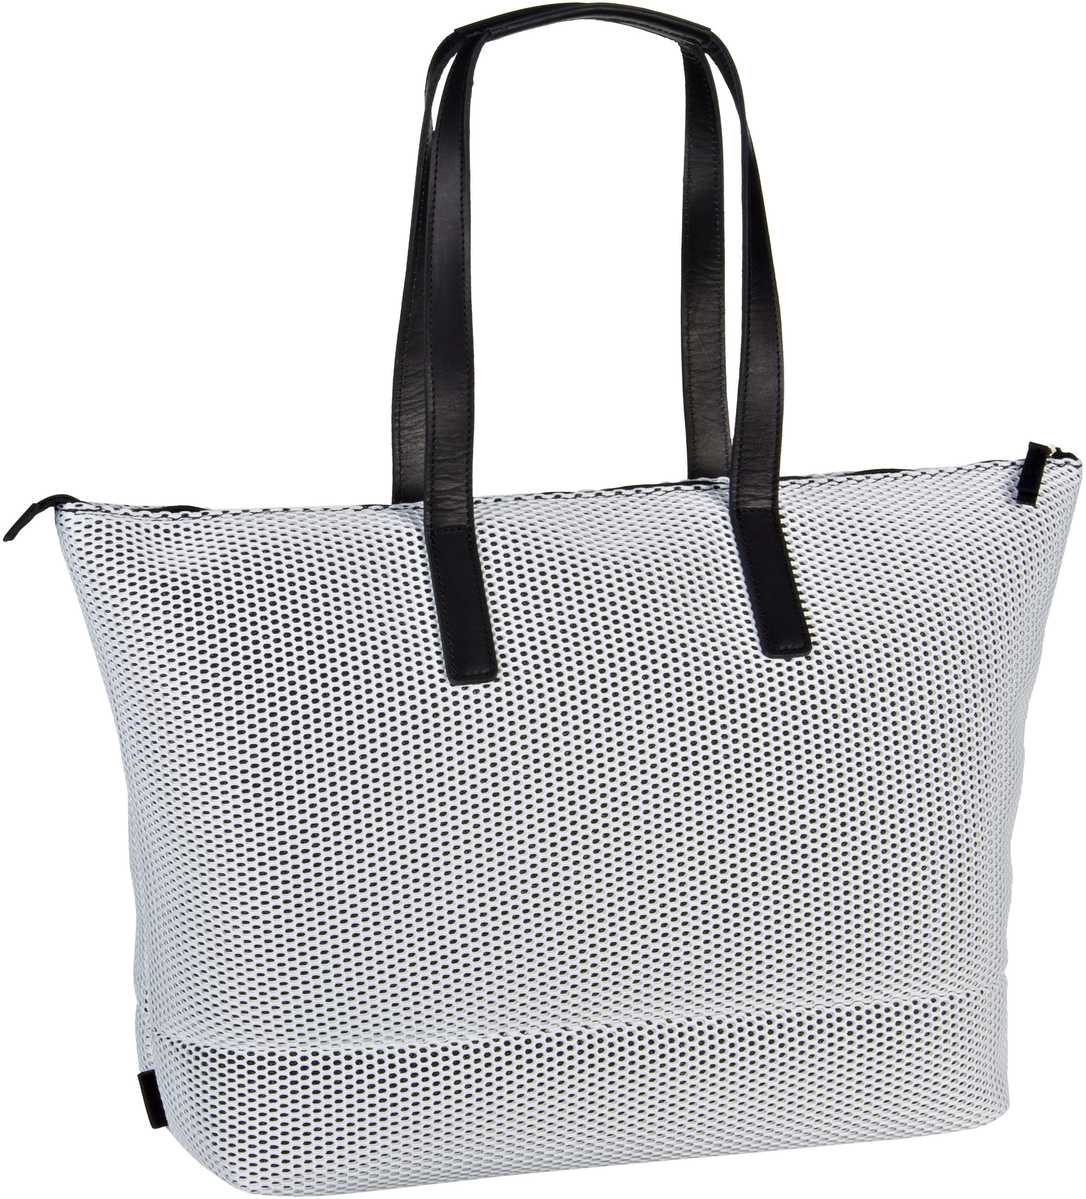 Handtasche Mesh 6183 Shopper Weiß